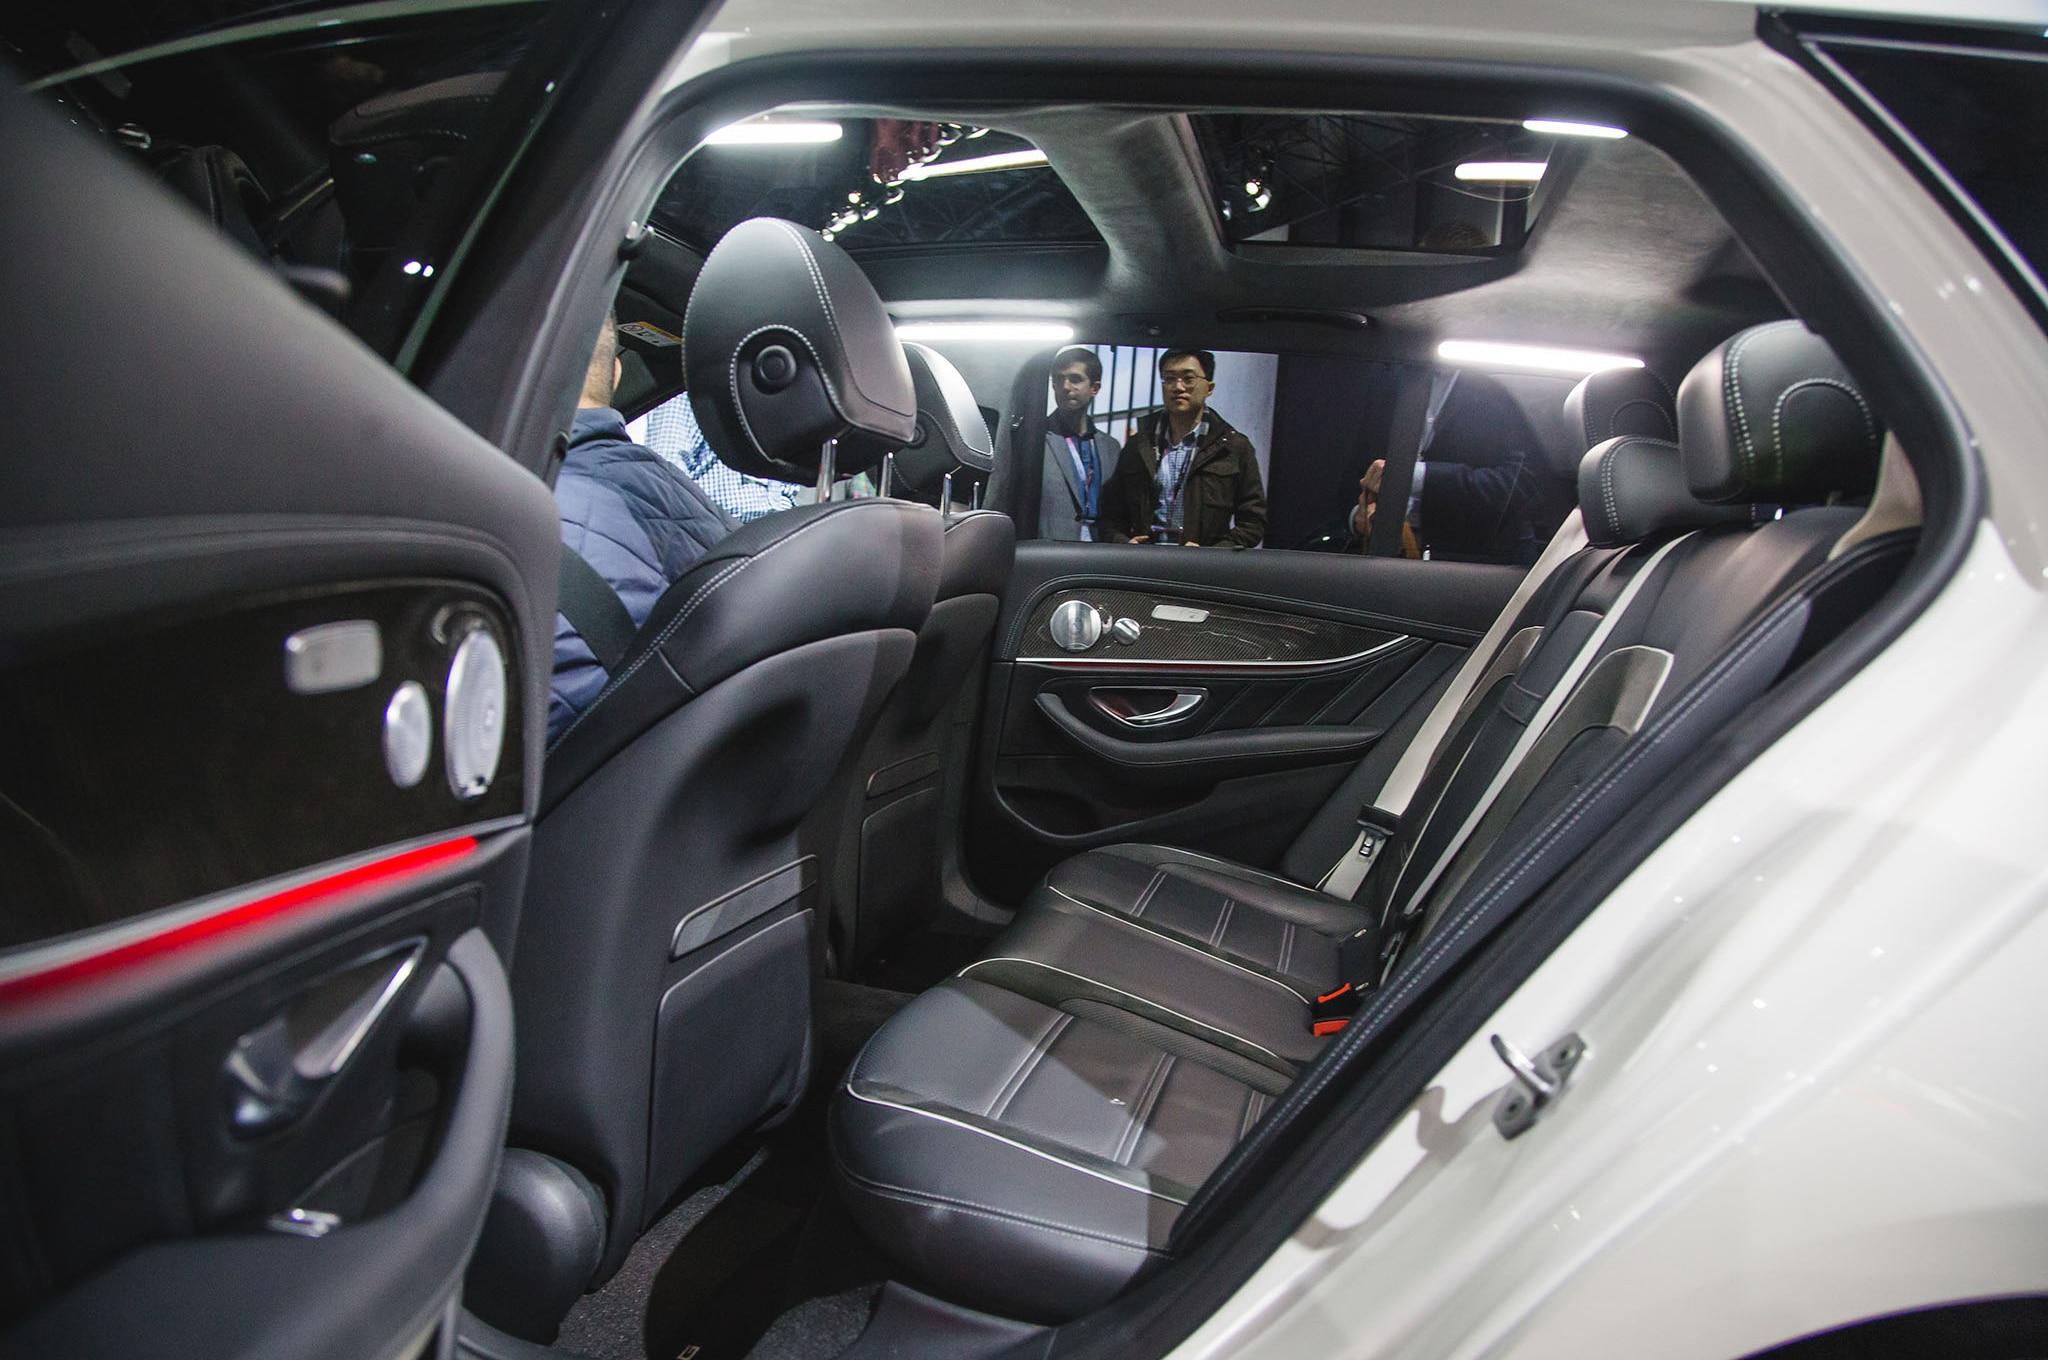 http://st.automobilemag.com/uploads/sites/11/2017/04/2018-Mercedes-AMG-E63-S-Wagon-rear-seat.jpg